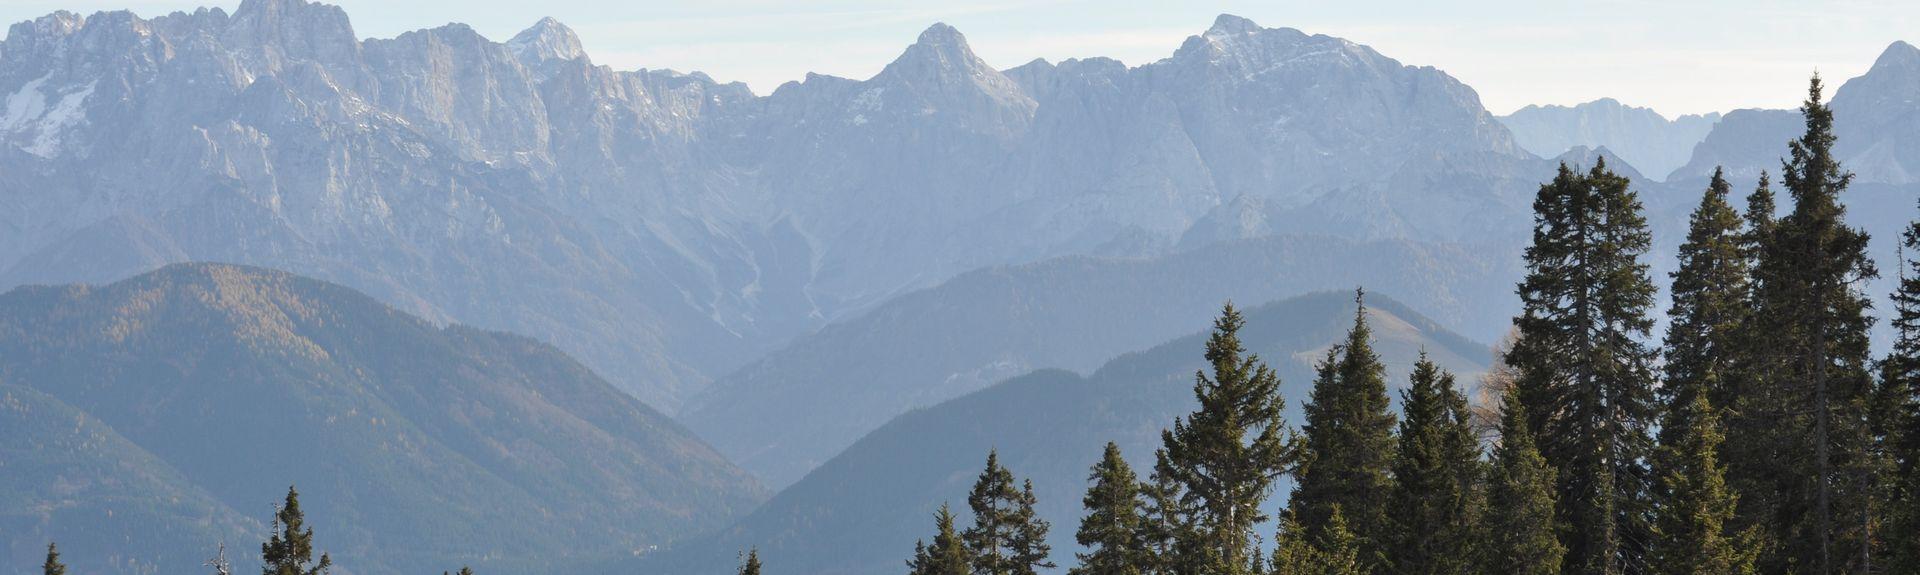 Schiefling am See, Karyntia, Austria